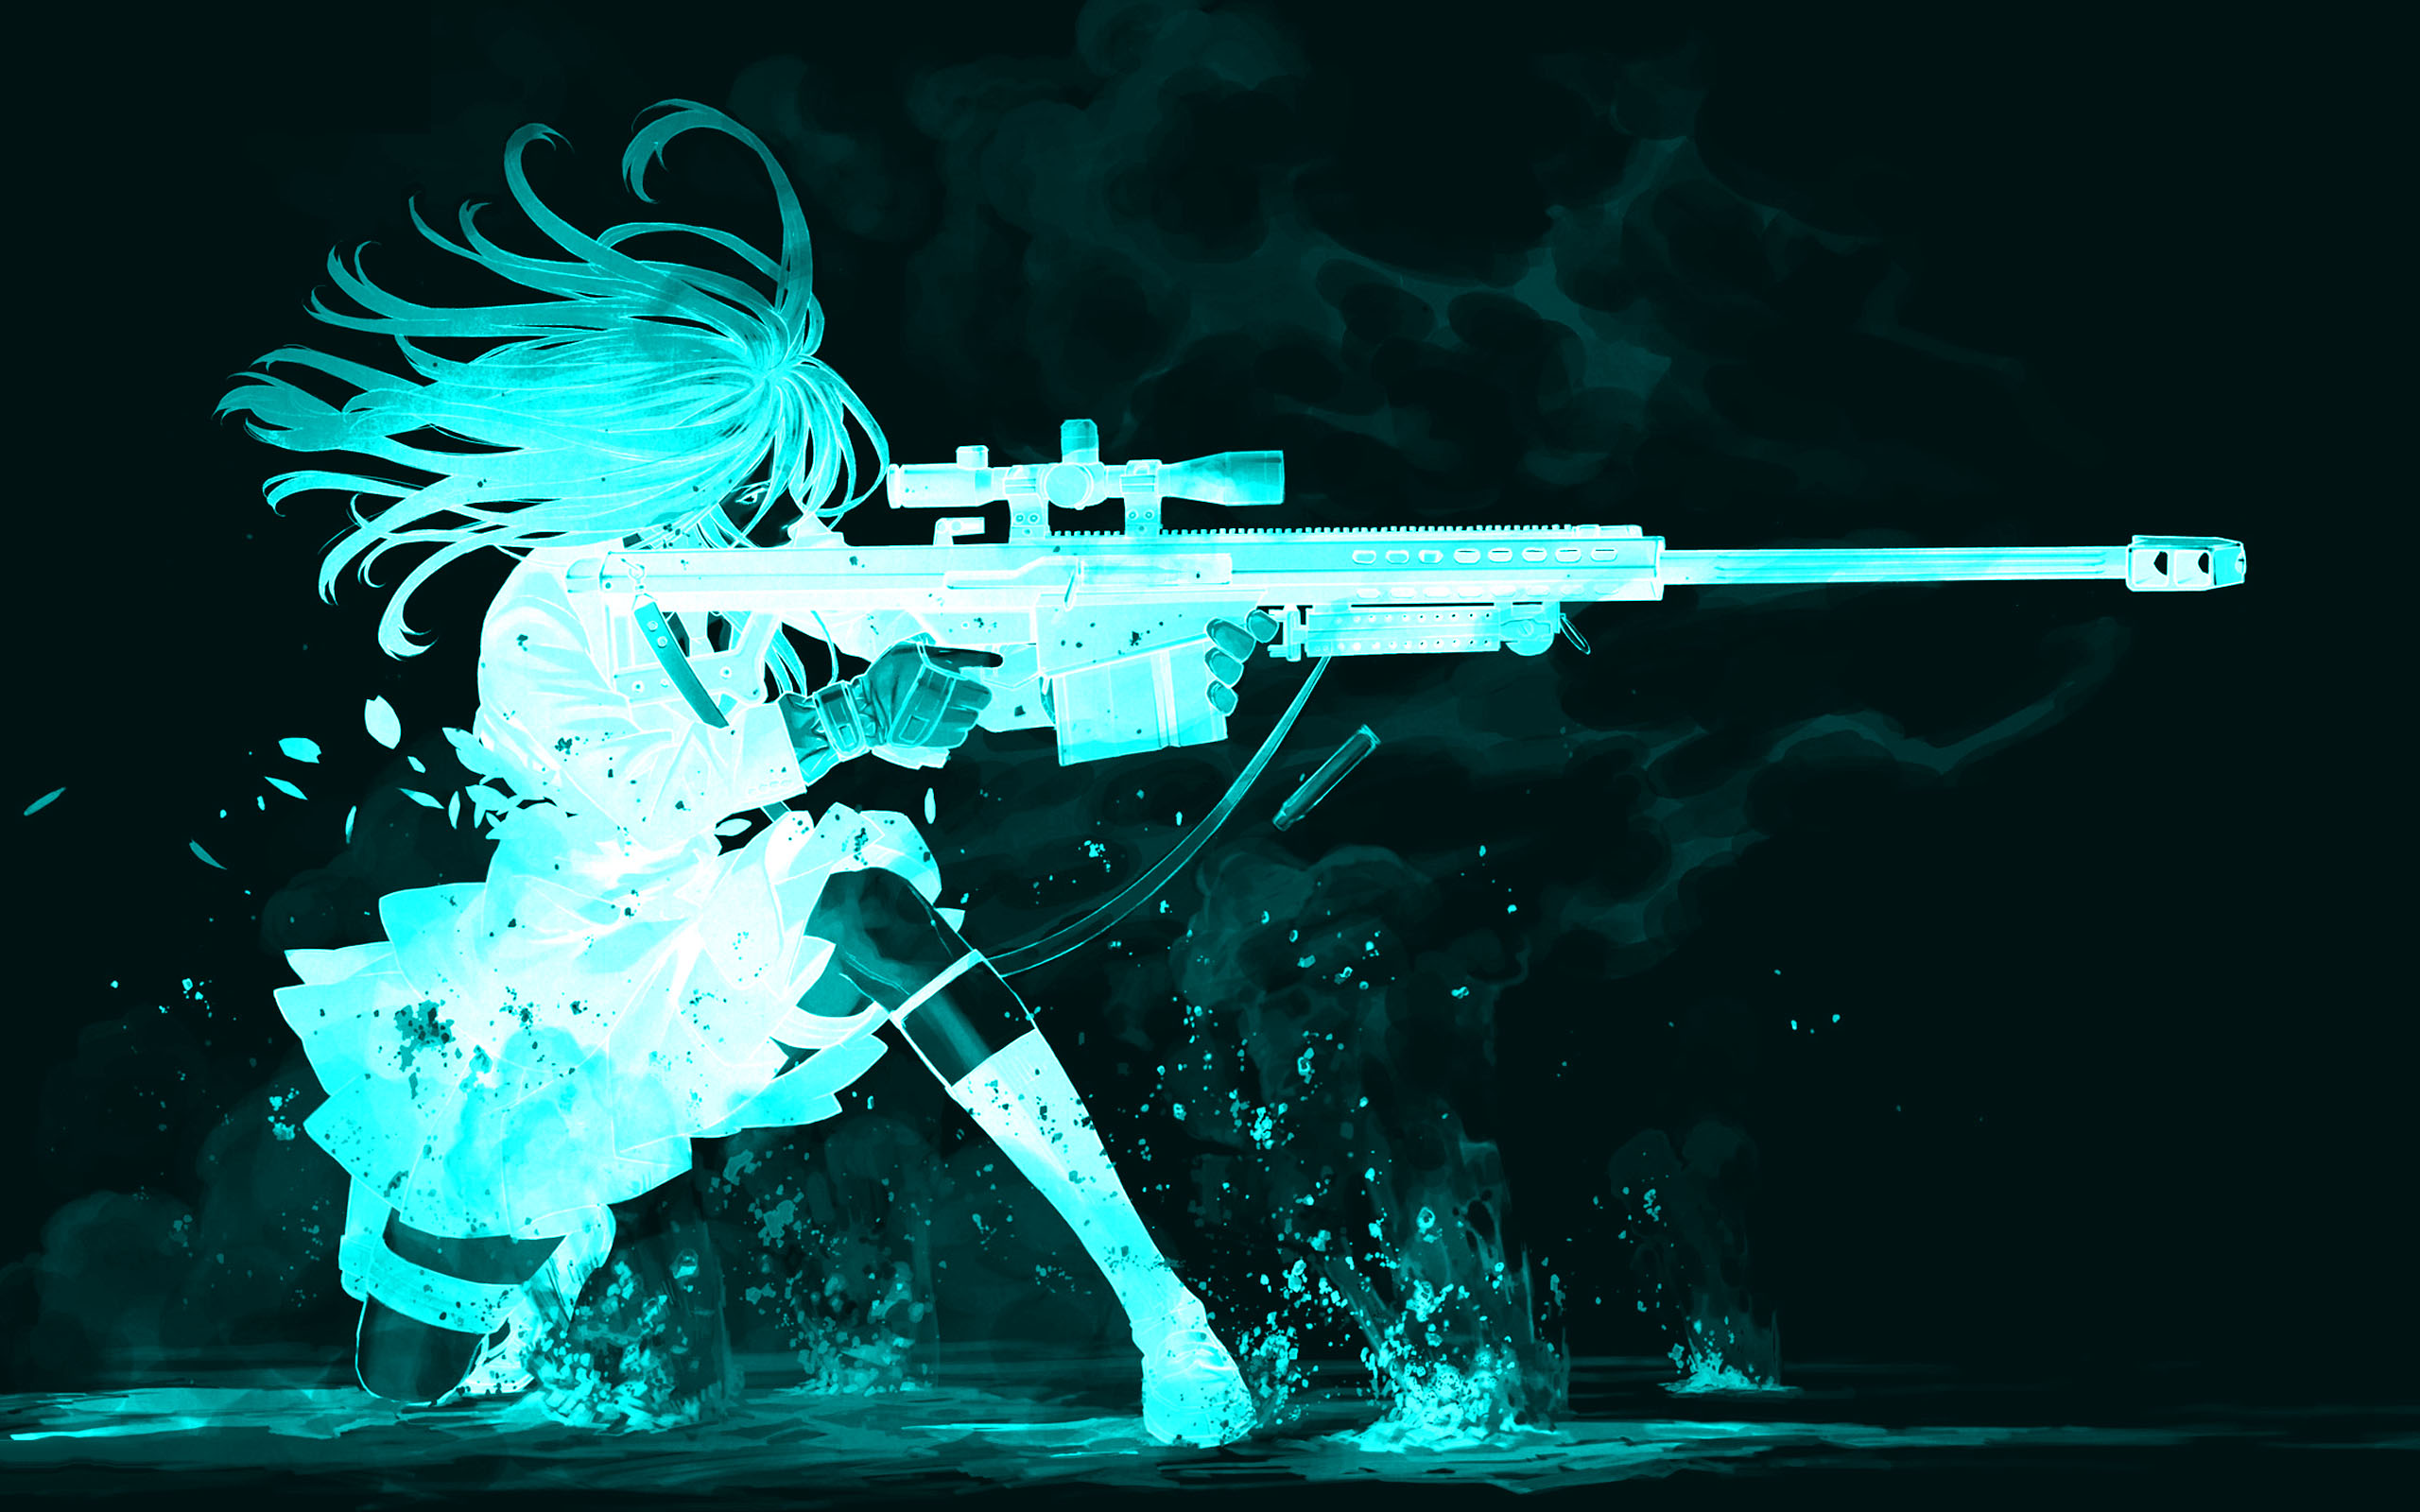 Gun Girl Computer Wallpapers Desktop Backgrounds 2560x1600 ID 2560x1600